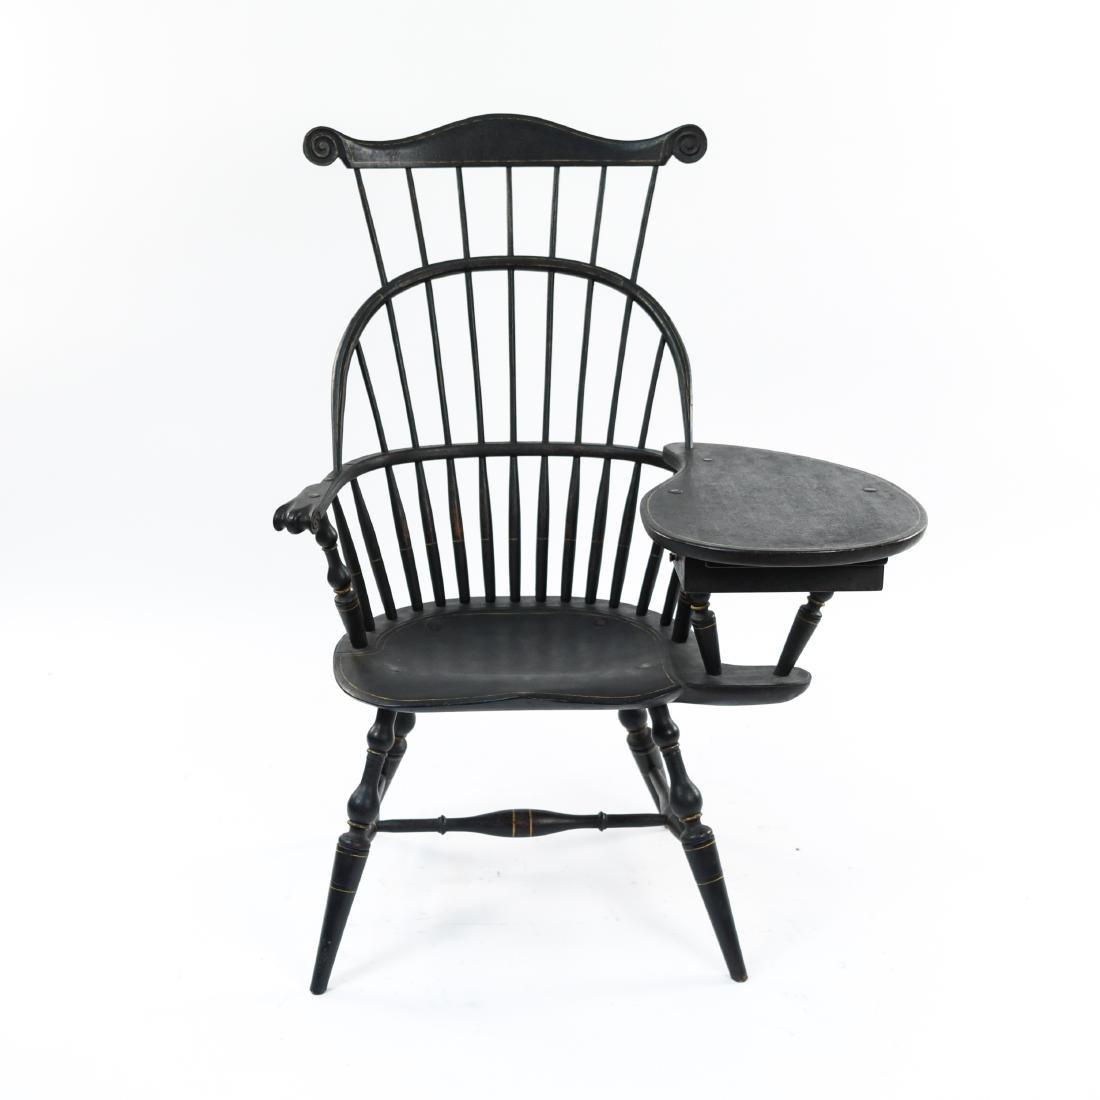 LEFT HANDED WINDSOR DESK CHAIR W/ TABLE